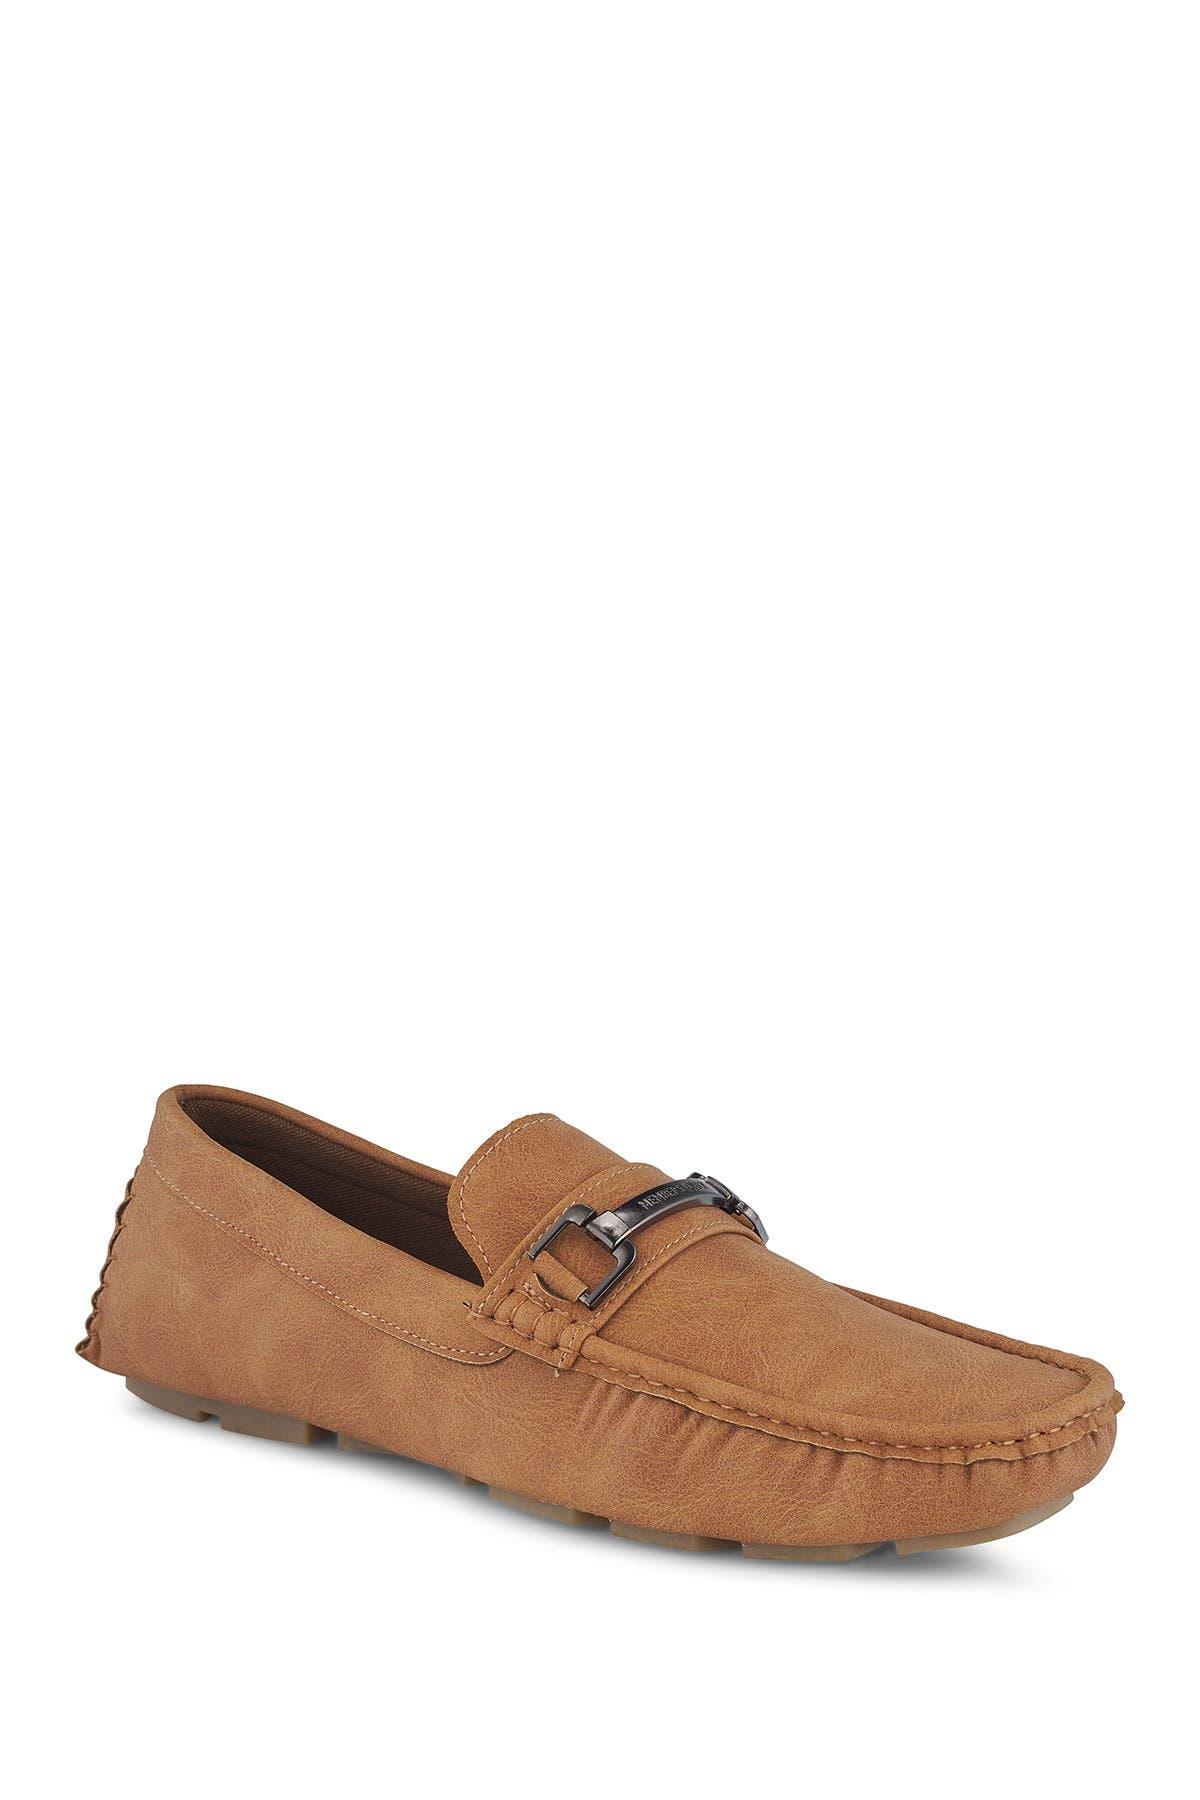 millenniumpaintingfl.com Loafers & Slip-Ons Shoes MXL Mens Driving ...